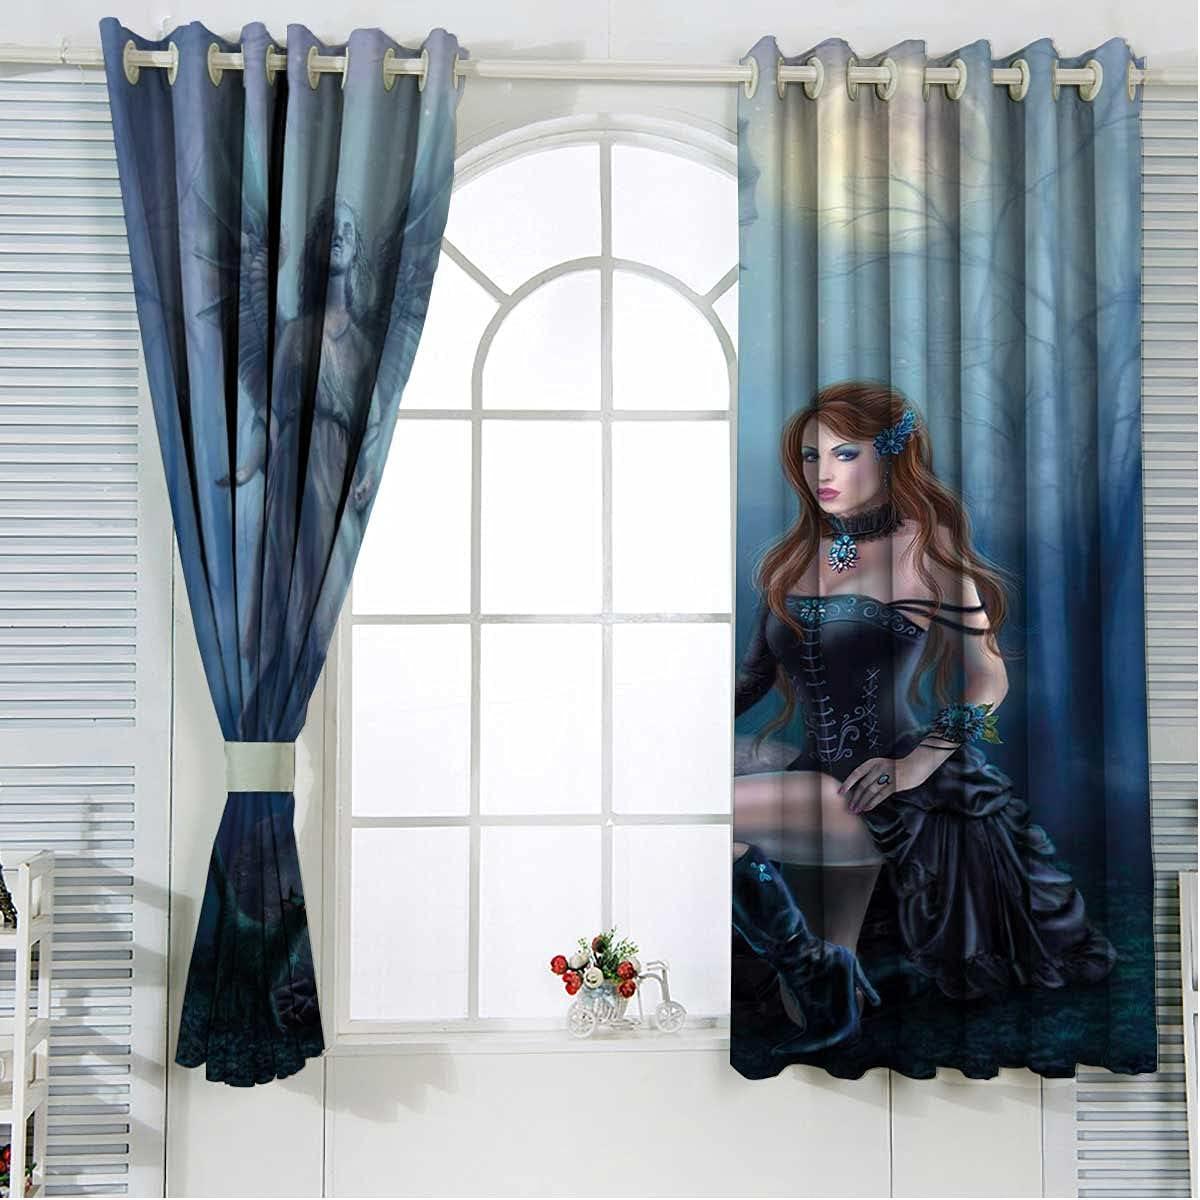 Washington Mall Vampire Blackout Curtain Panels 2 Inches Length mart Multicol Set 63